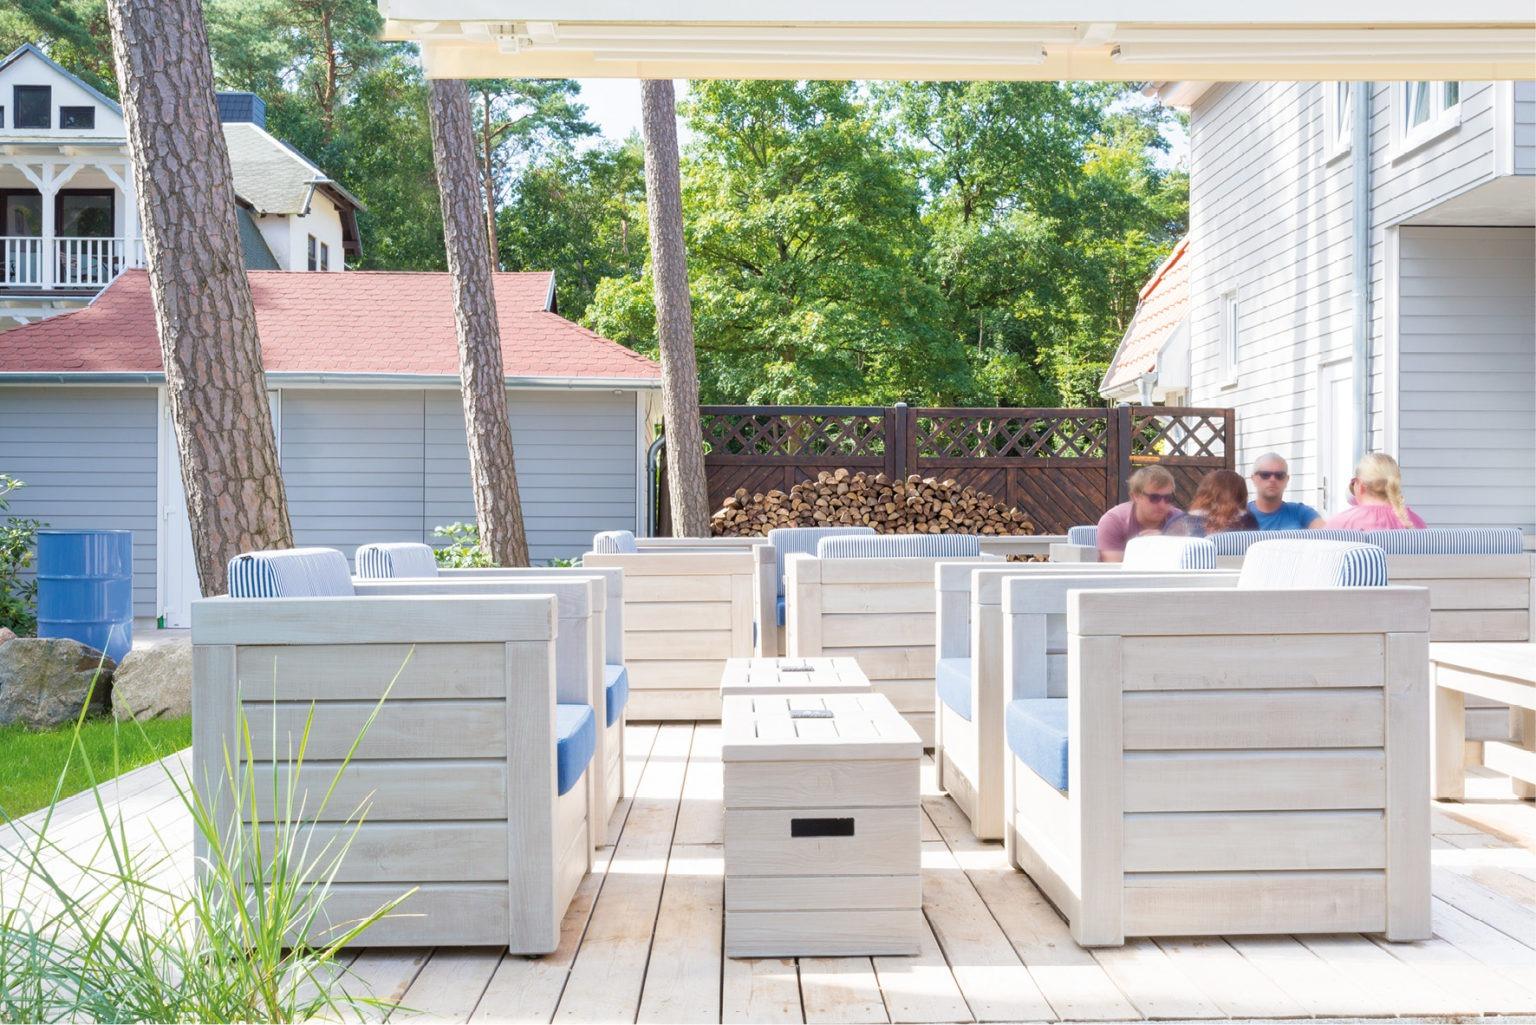 Terrassen Möbel, Aussengastronomie, Lounge Möbel, Sessel Sofa, Lounge Tisch